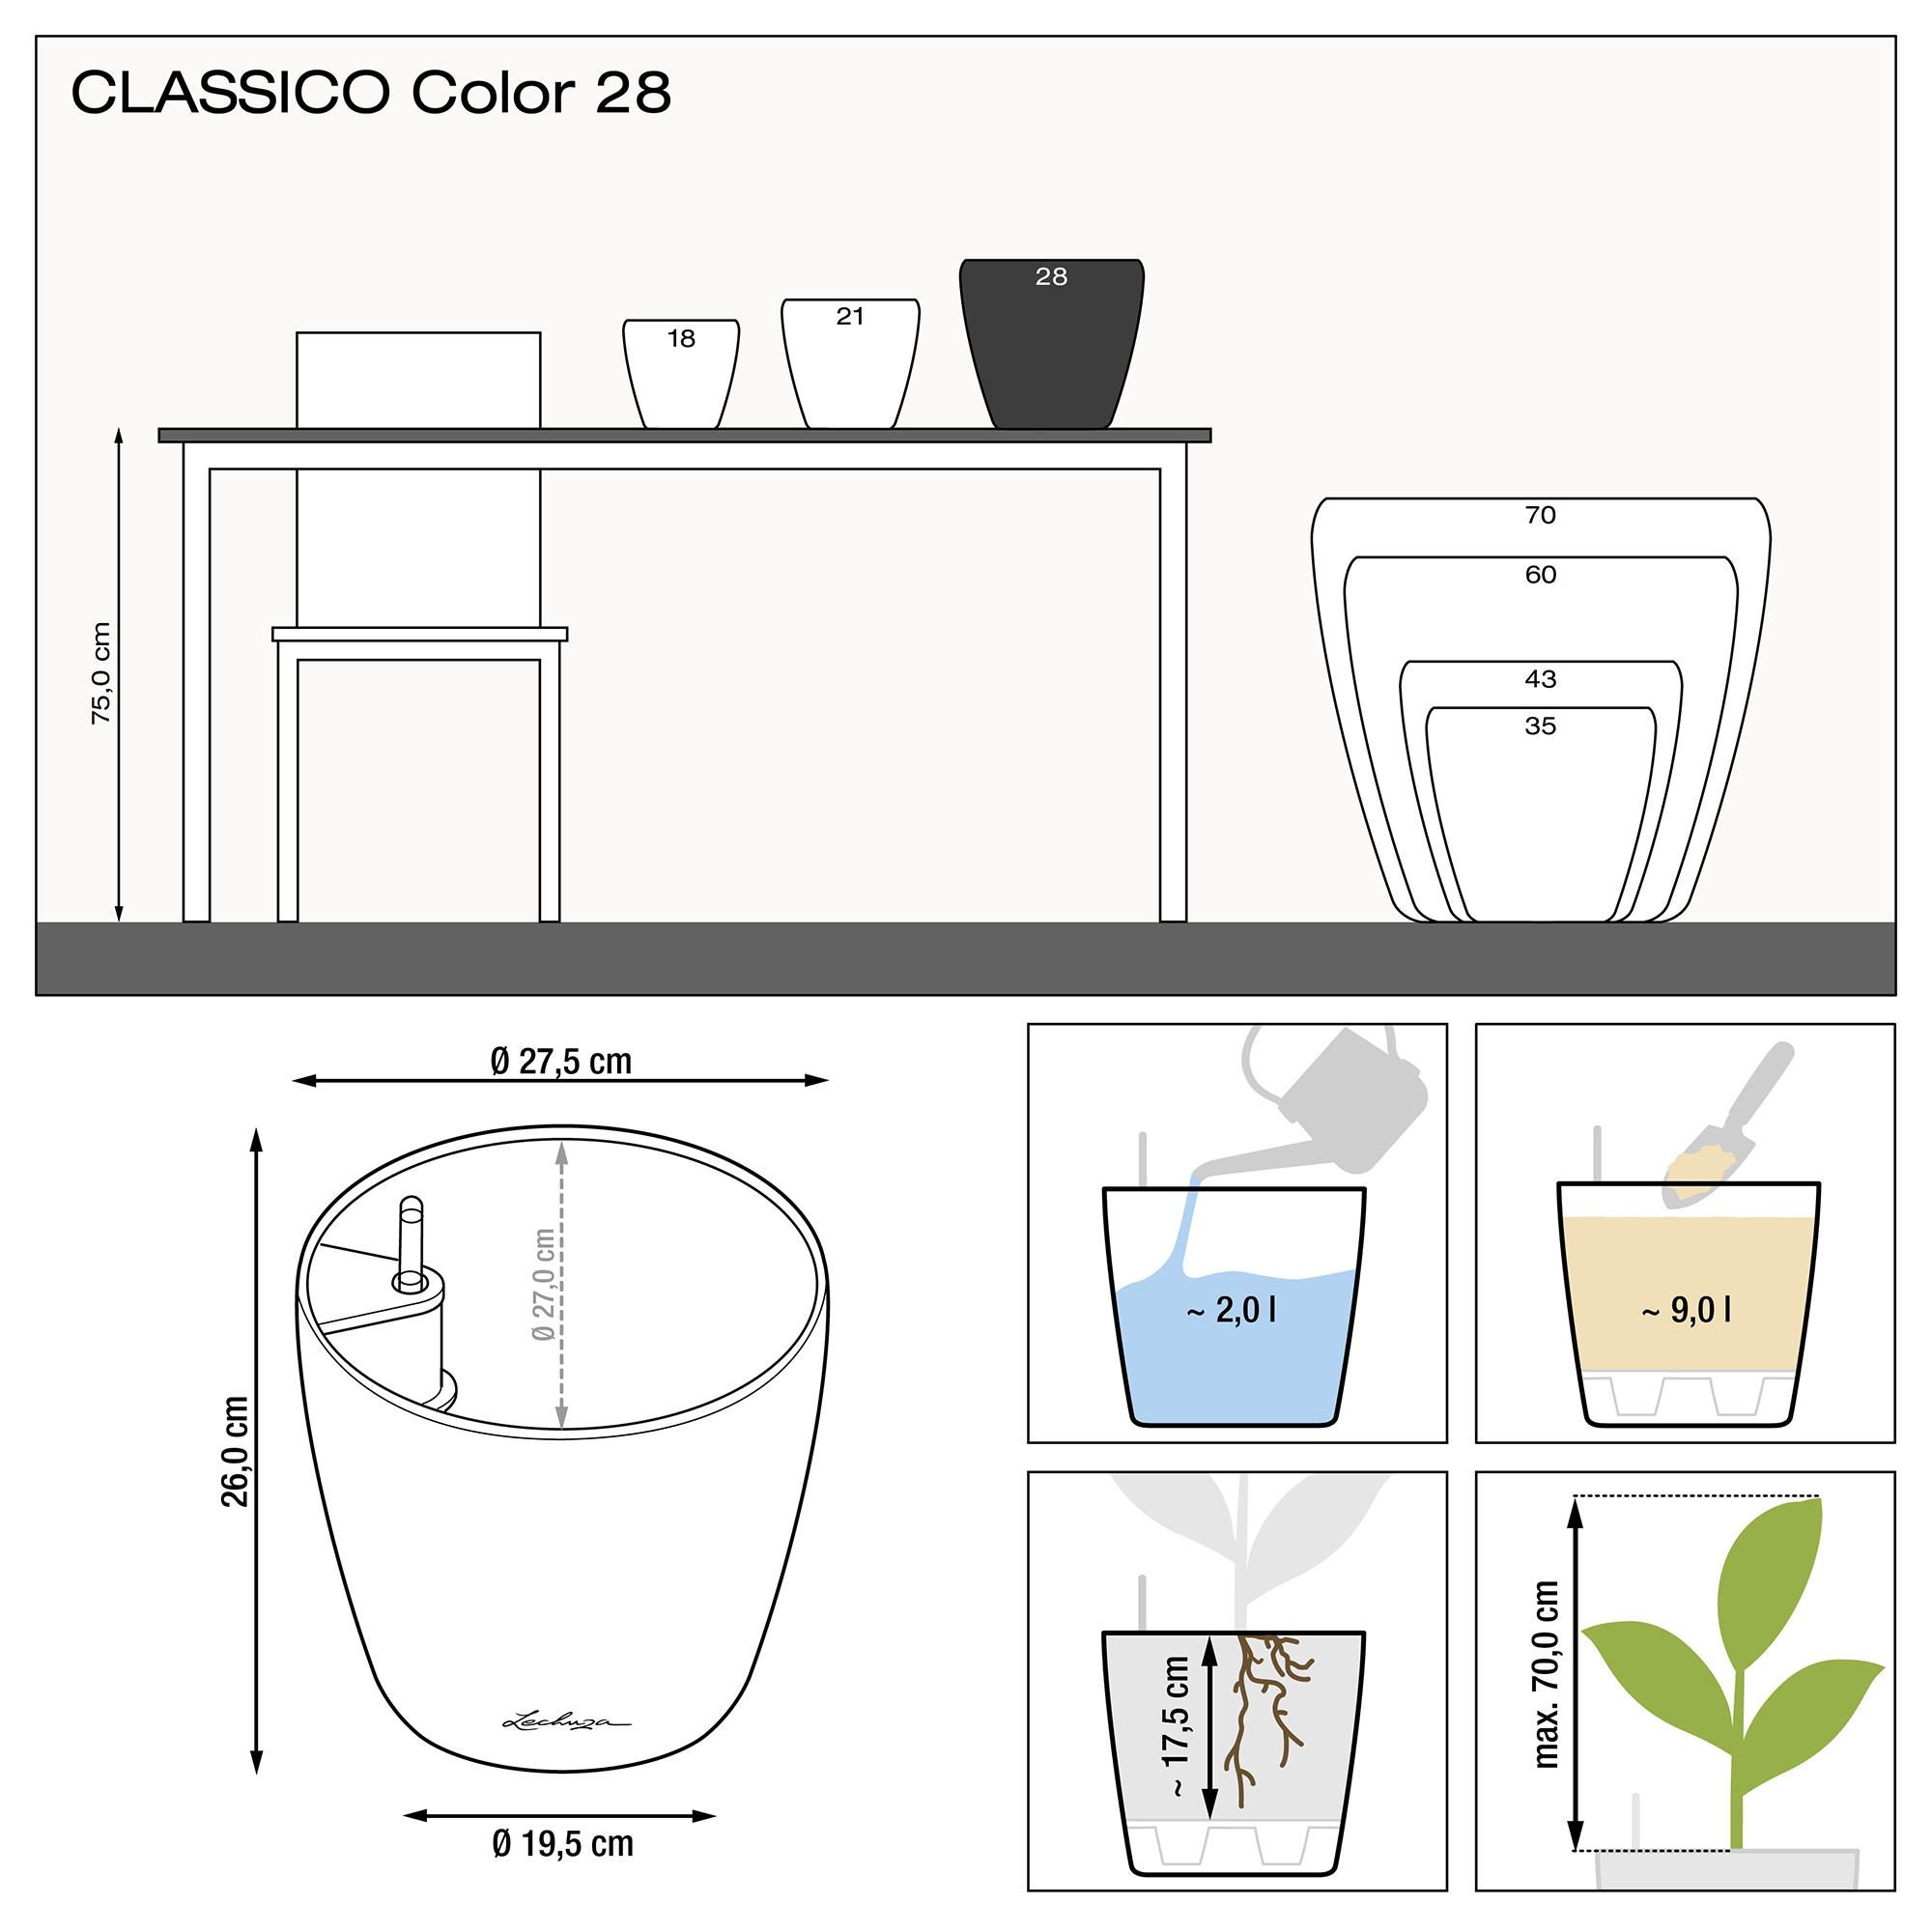 CLASSICO Color 28 weiß - Bild 2